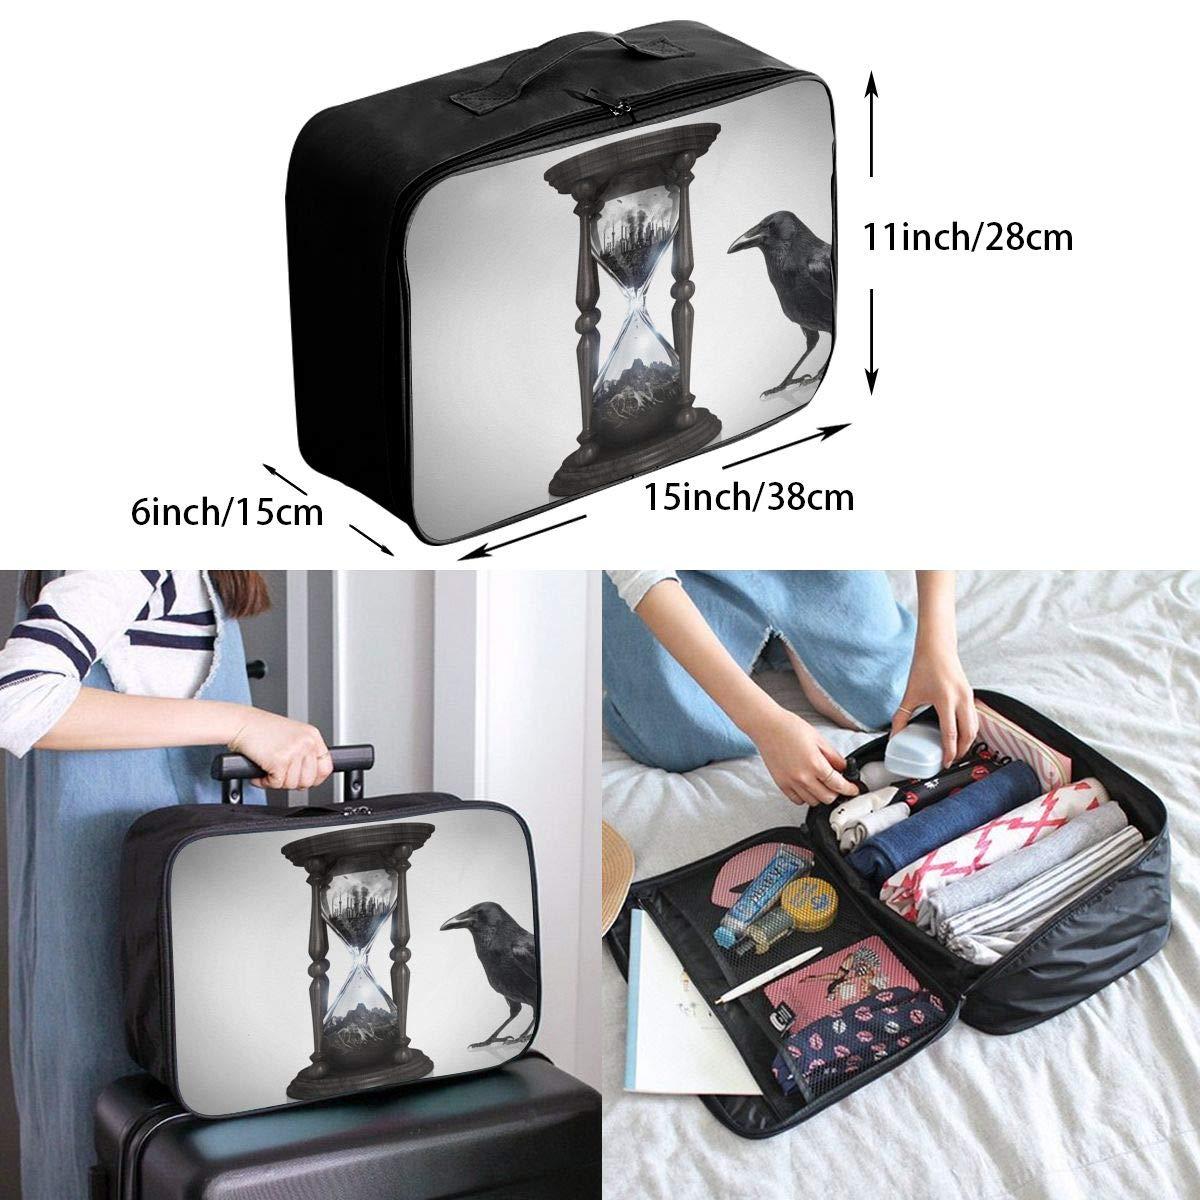 Travel Luggage Duffle Bag Lightweight Portable Handbag Hourglass Crow Large Capacity Waterproof Foldable Storage Tote